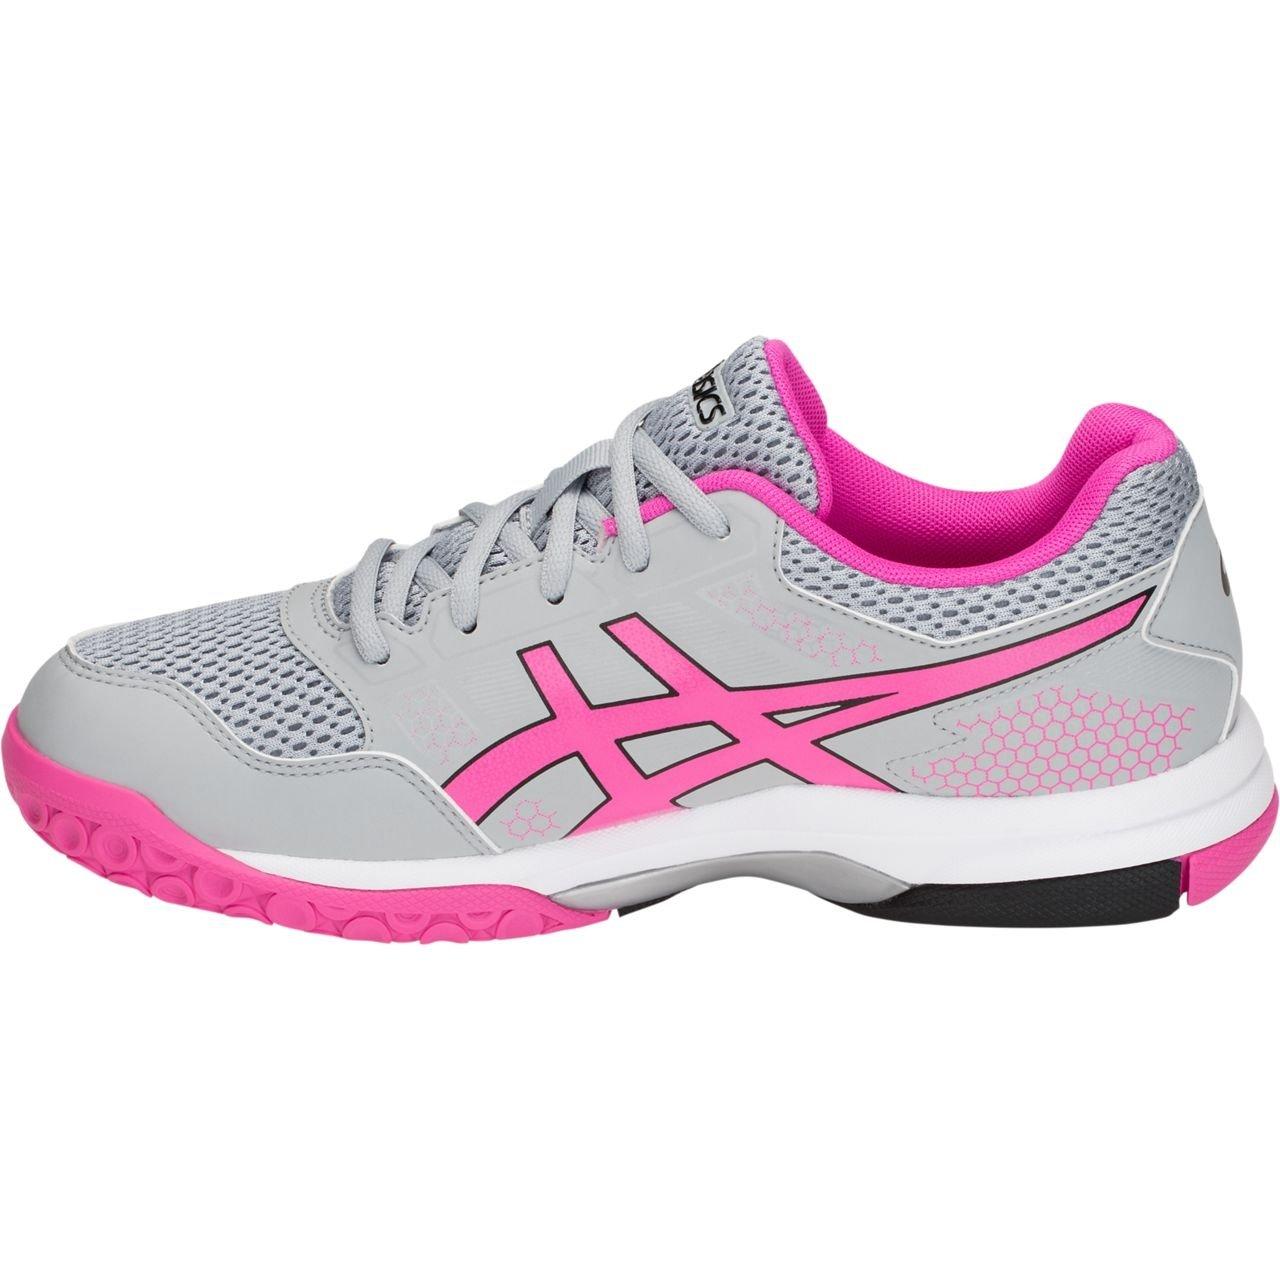 ASICS Women's Gel-Rocket US|Mid 8 Volleyball Shoe B0788JH4L1 10.5 M US|Mid Gel-Rocket Grey/Pink Glo c5f0c5